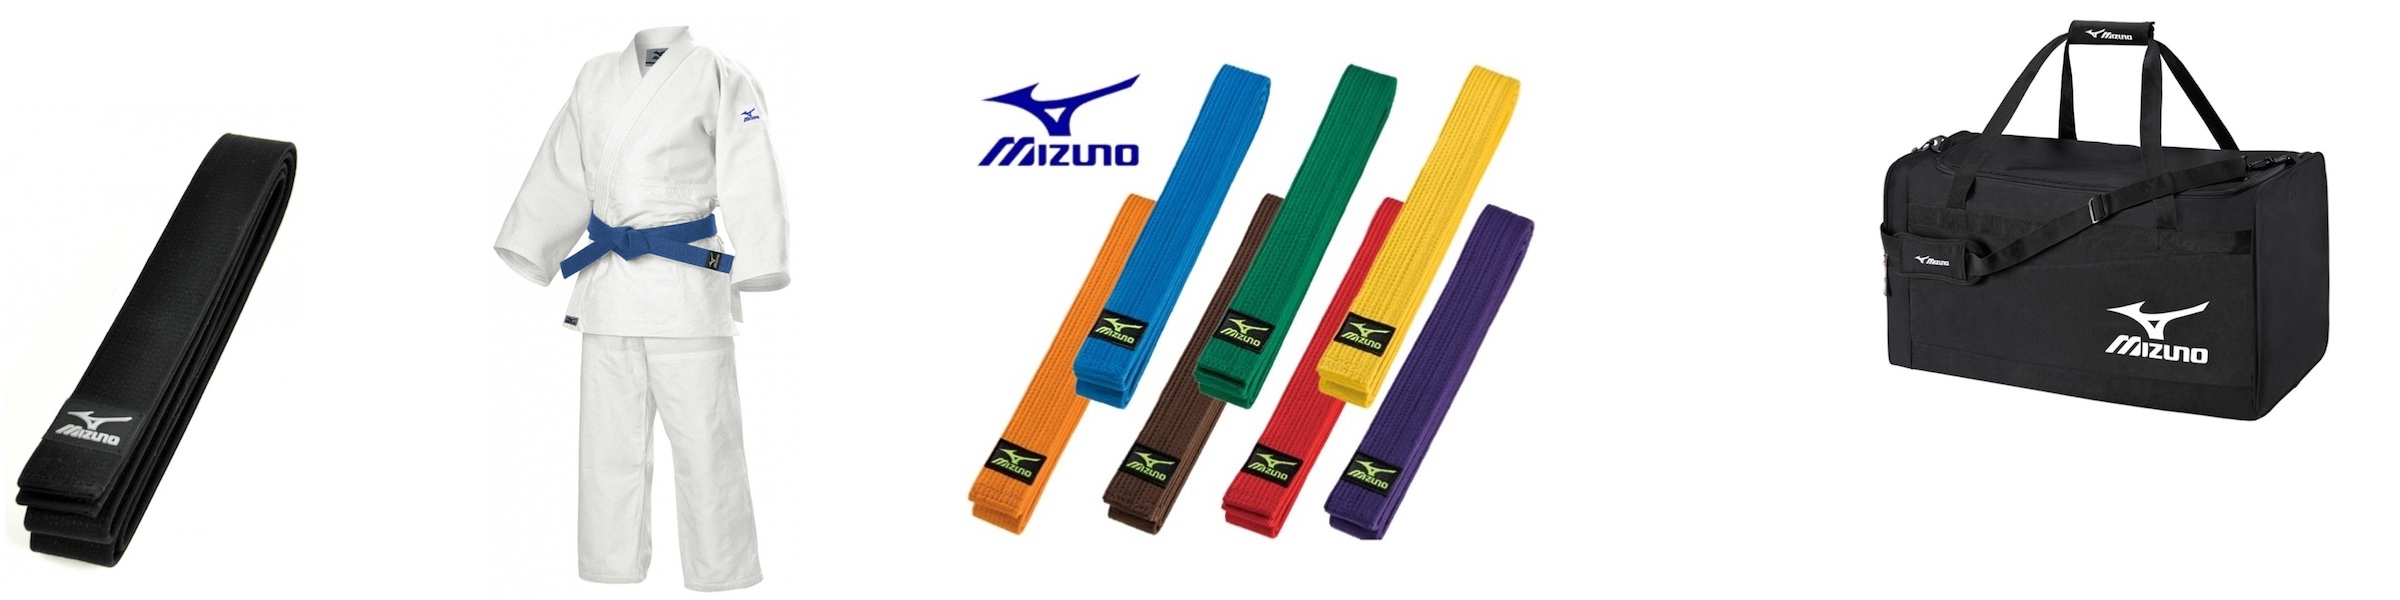 4fae64e86e Mizuno kimono, Judogi, Judo, équipement arts martiaux adidas & sport de  combat